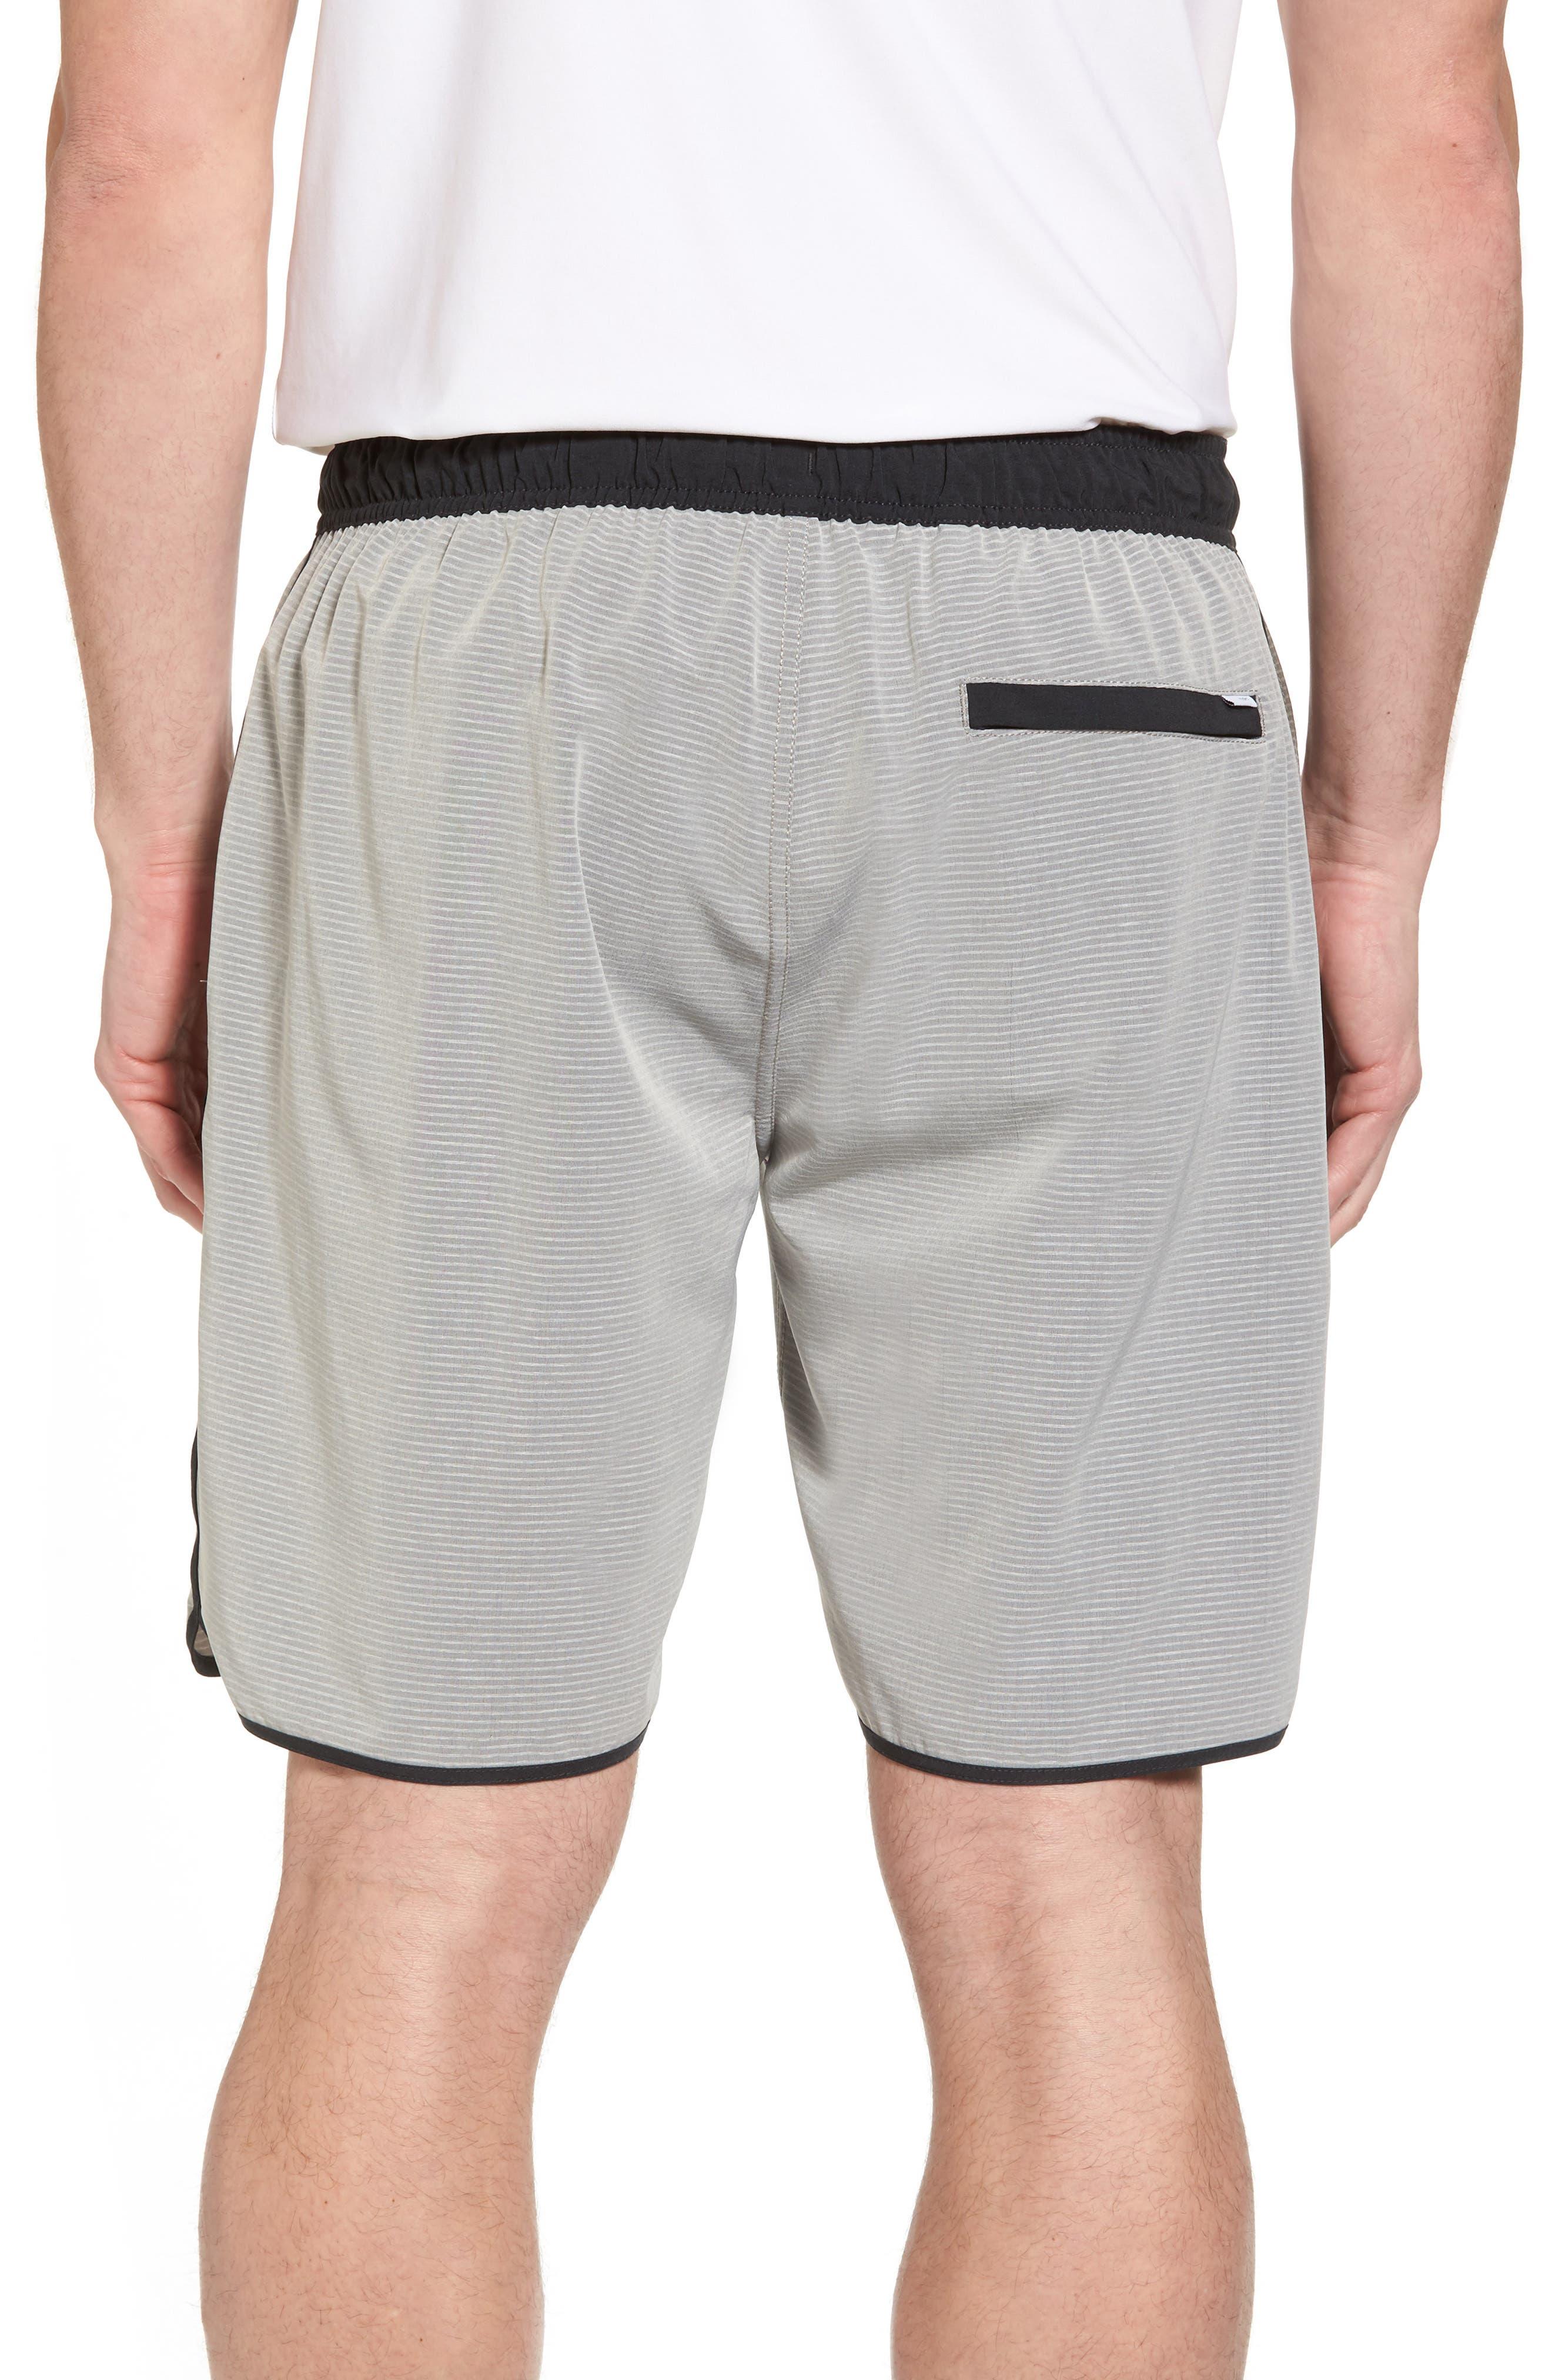 Banks Athletic Shorts,                             Alternate thumbnail 2, color,                             050